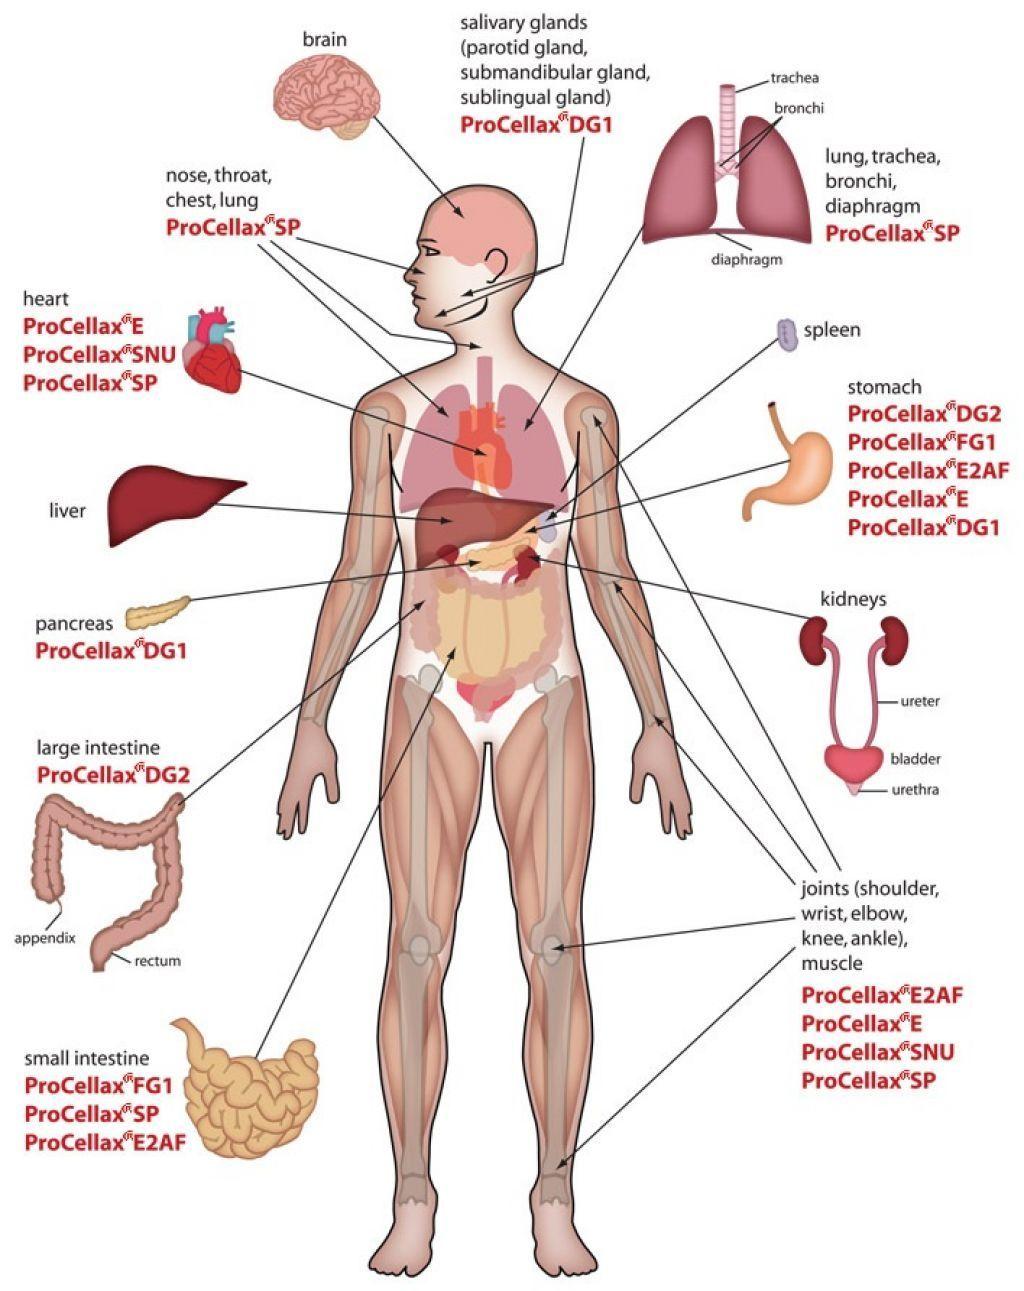 Human Body Picture Of Organs Human Anatomy Study Human Body